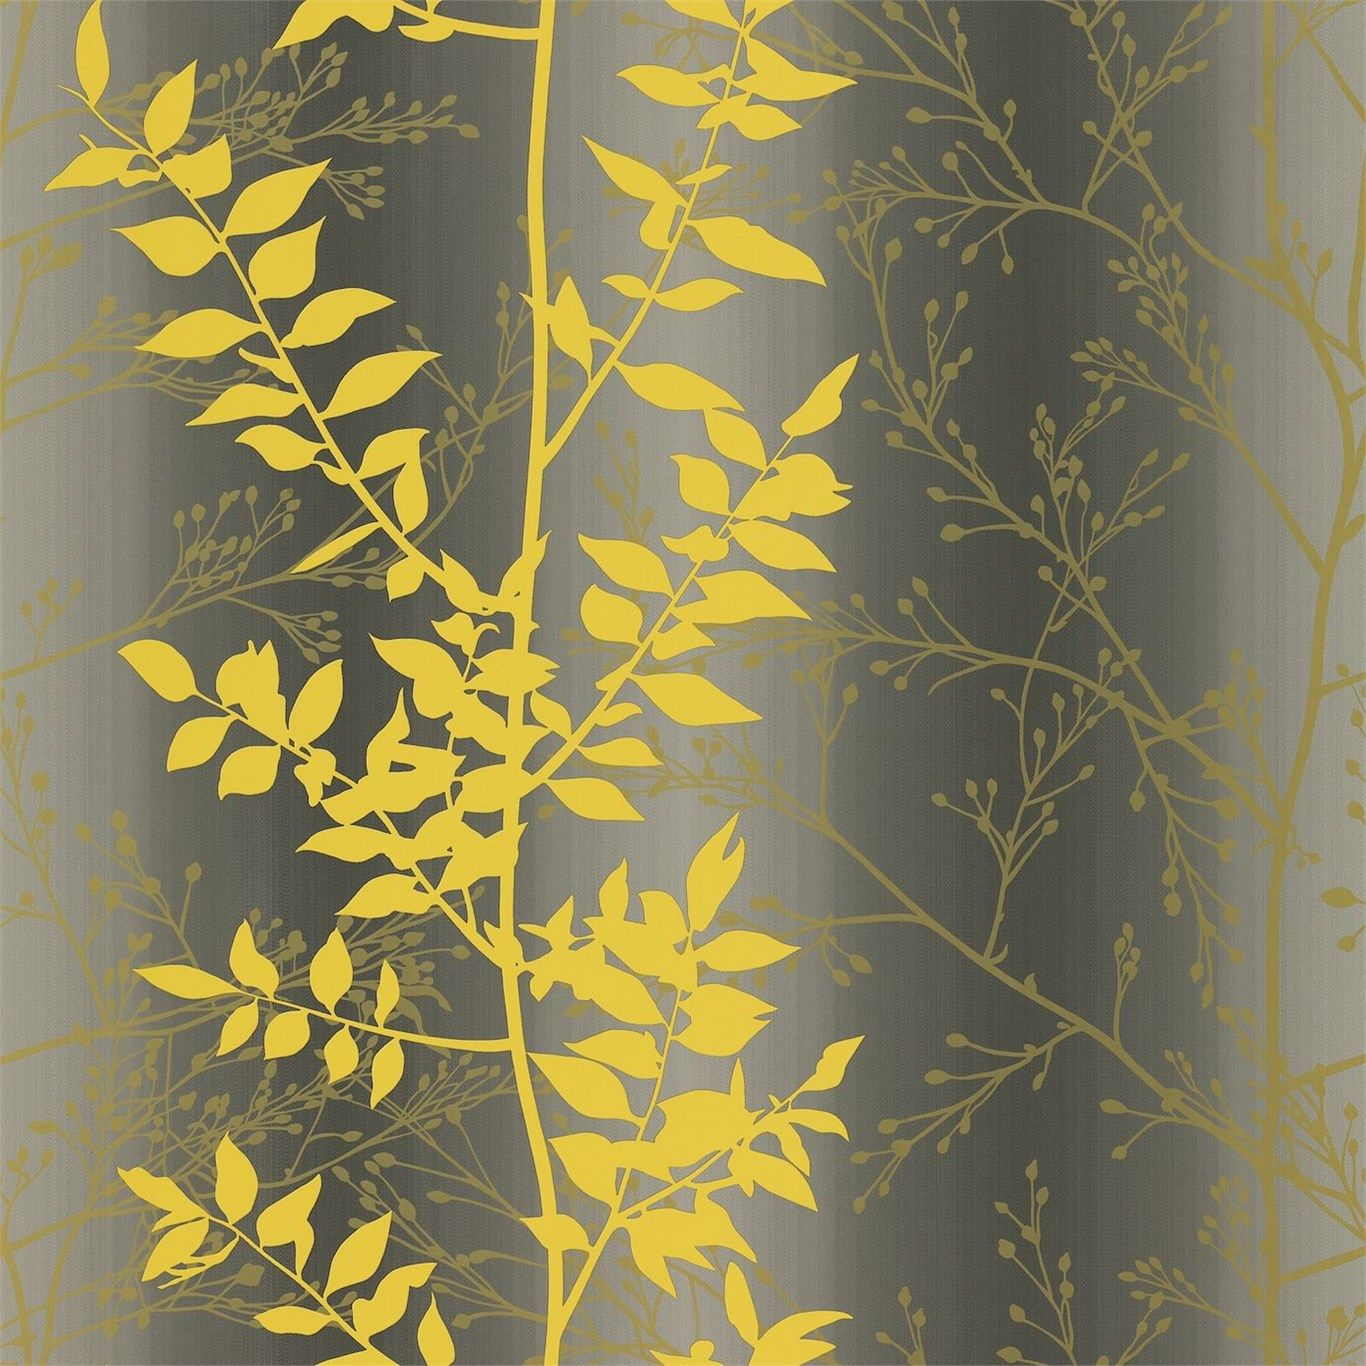 Products harlequin designer fabrics and wallpapers paradise - Products Harlequin Designer Fabrics And Wallpapers Persephone Hcla110187 Kallianthi Wallpapers